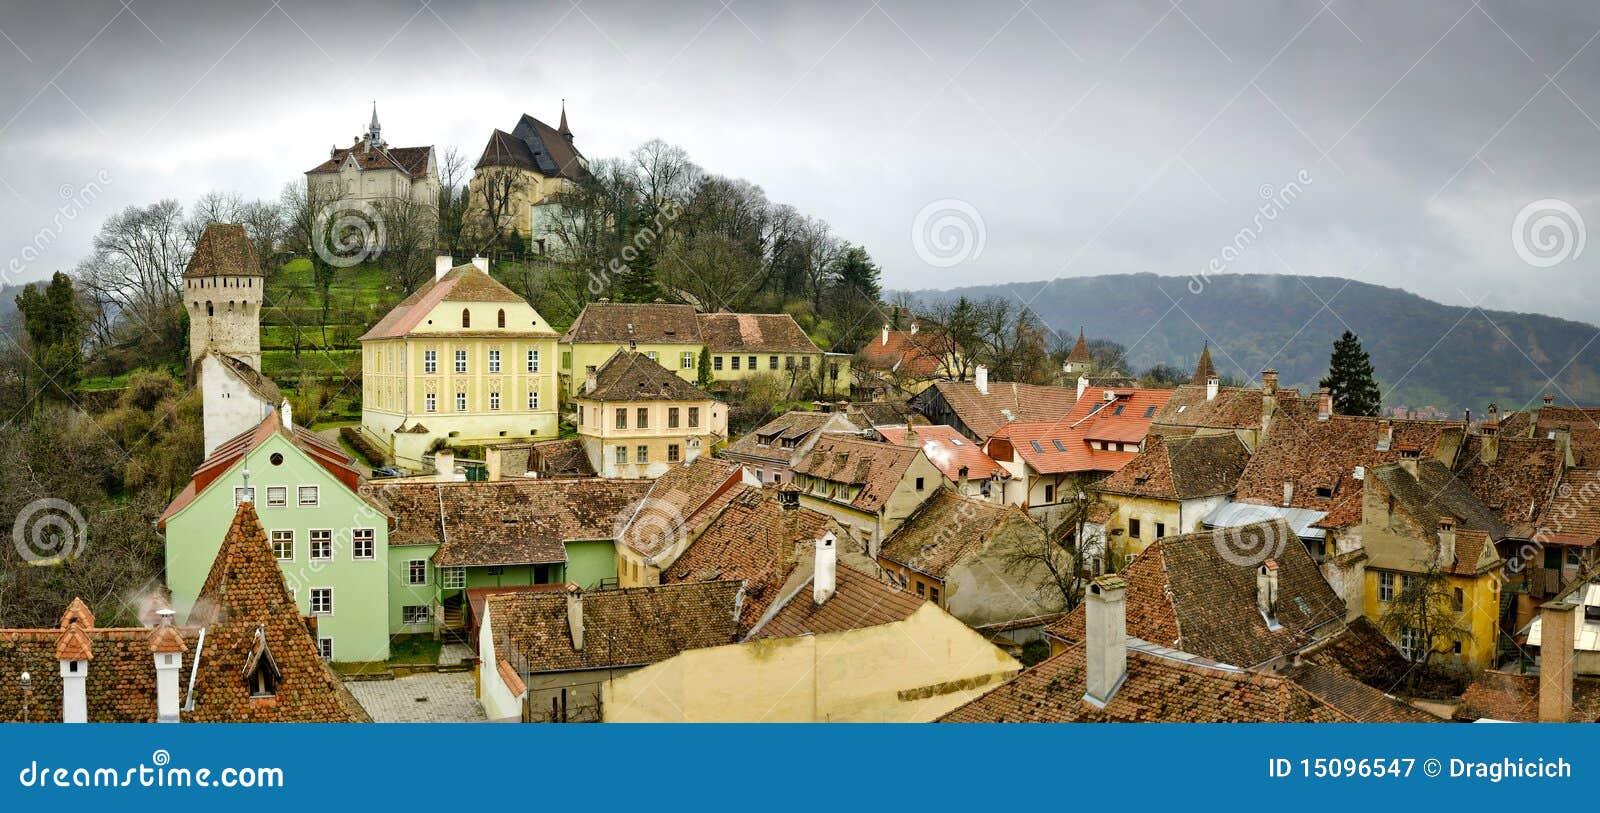 Sighisoara, middeleeuwse stad in Transsylvanië